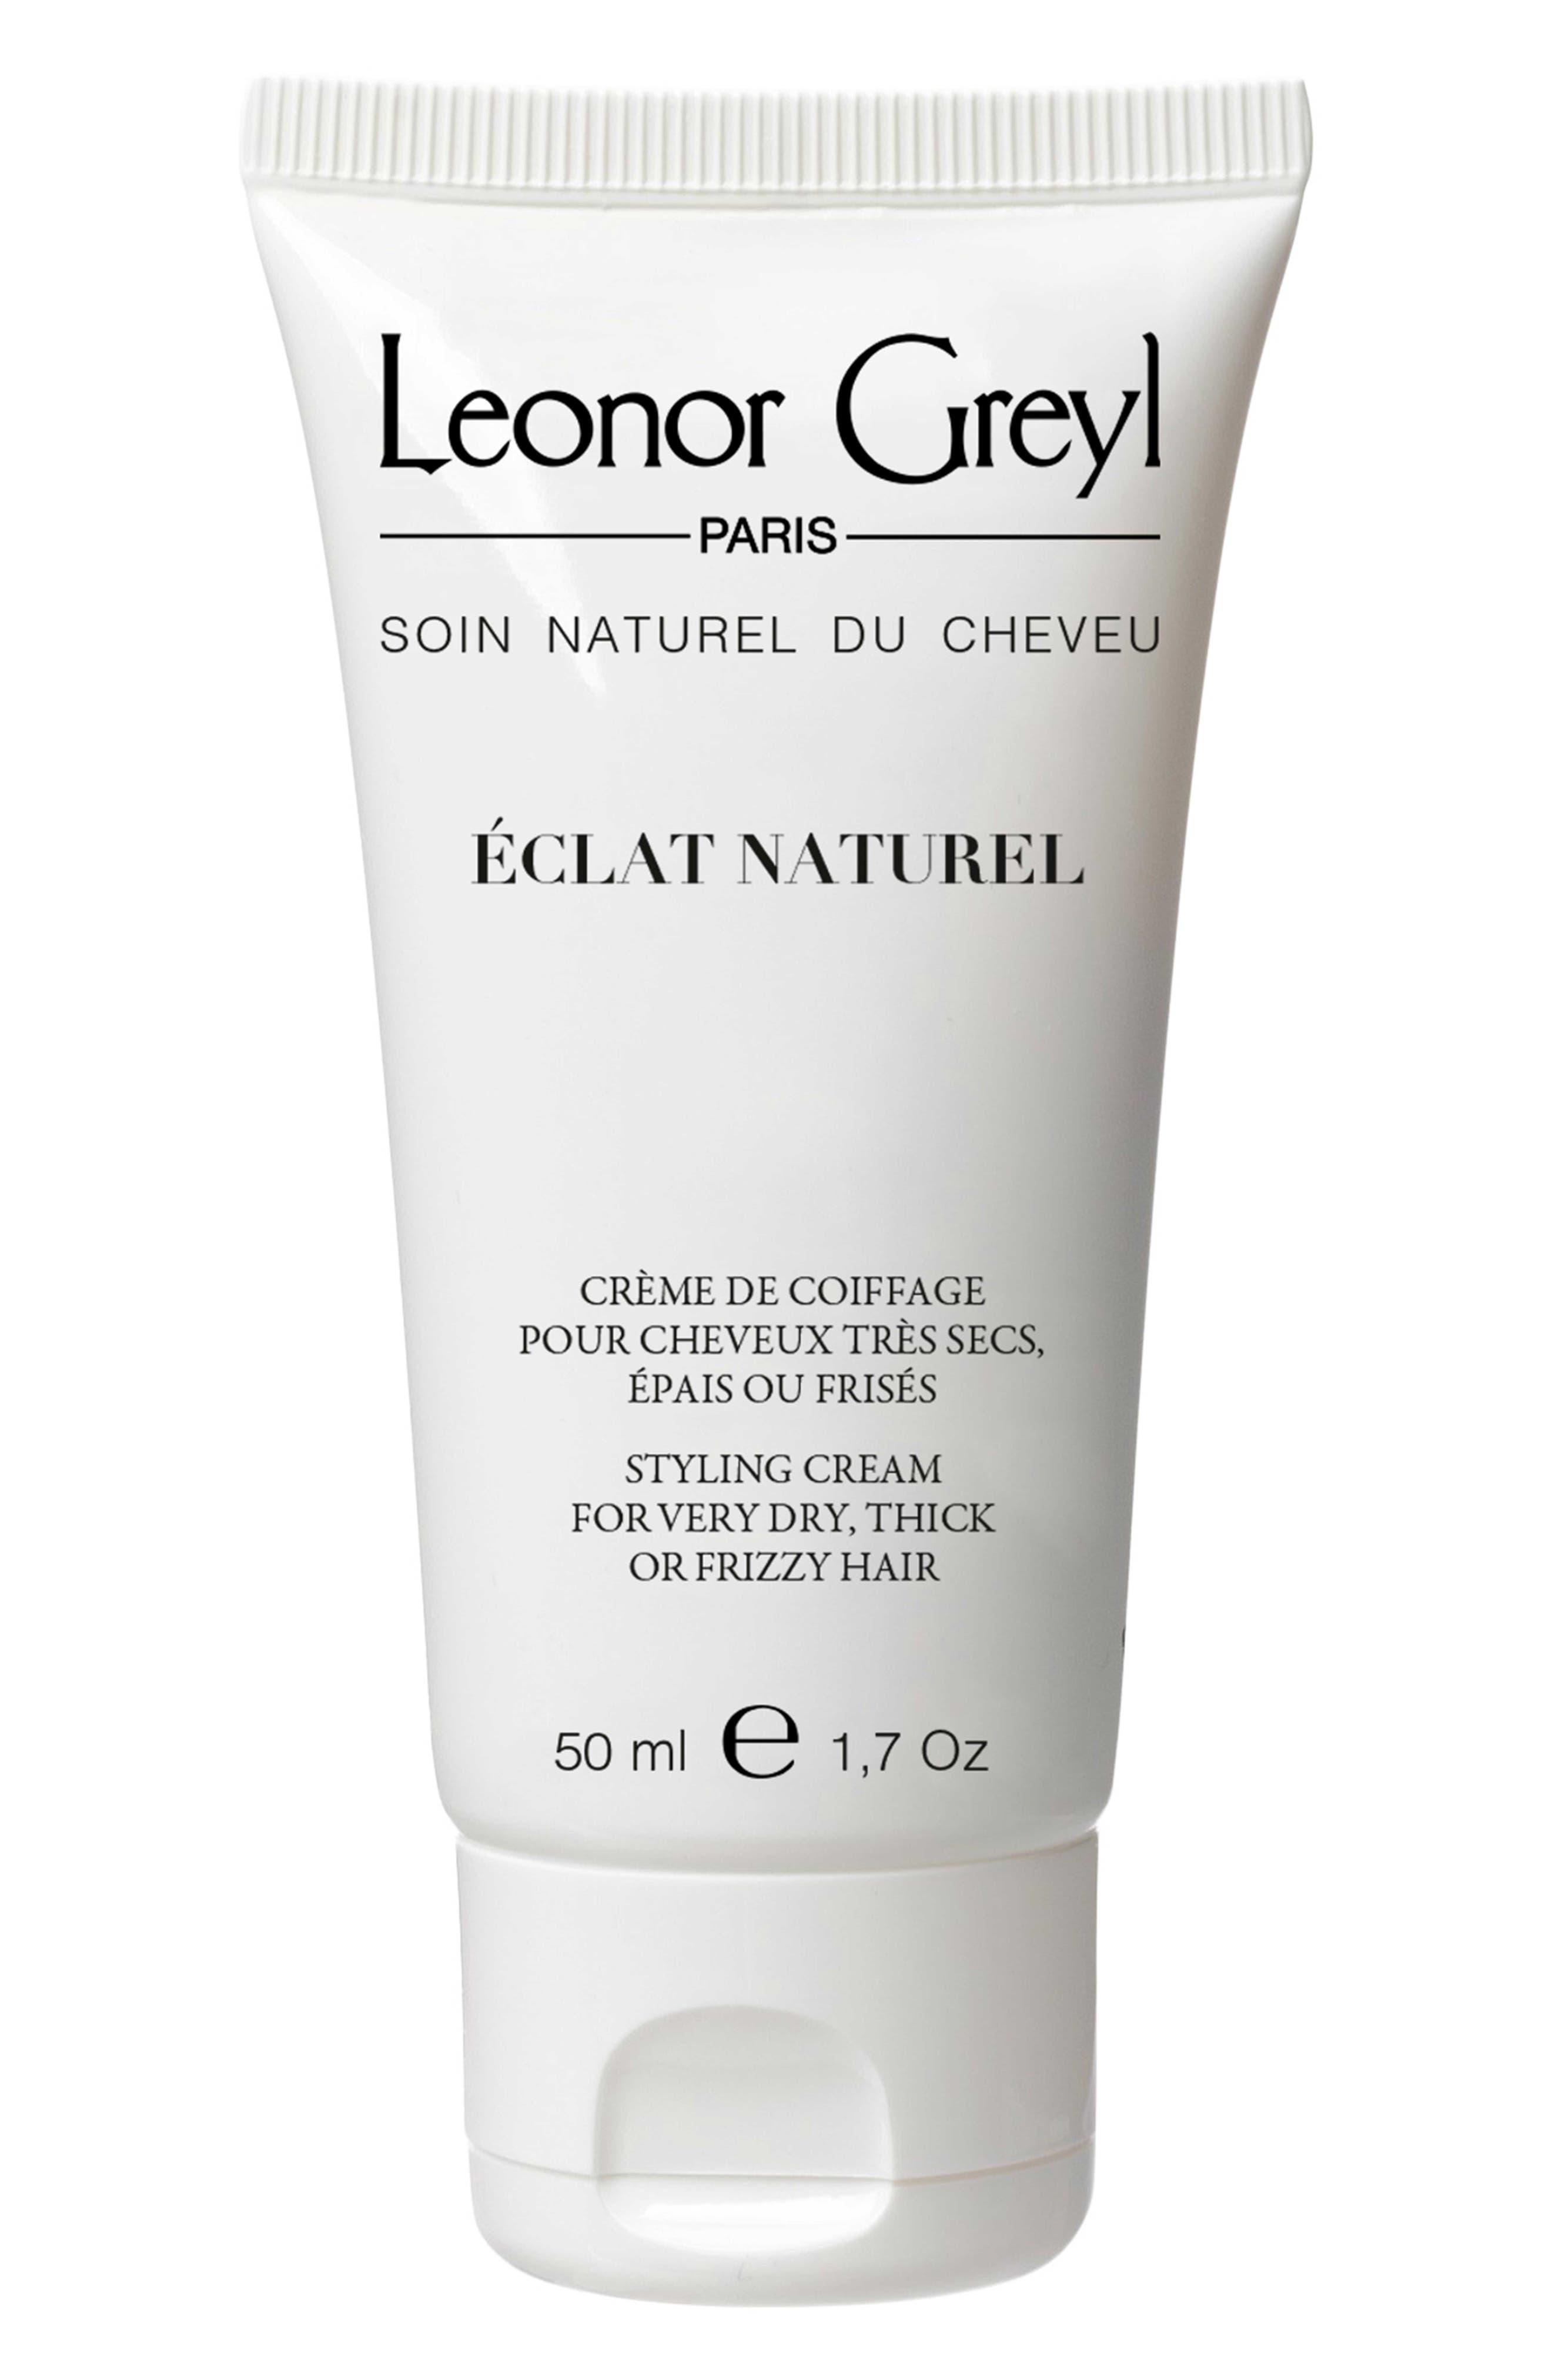 Alternate Image 1 Selected - Leonor Greyl PARIS 'Éclat Naturel' Styling Cream